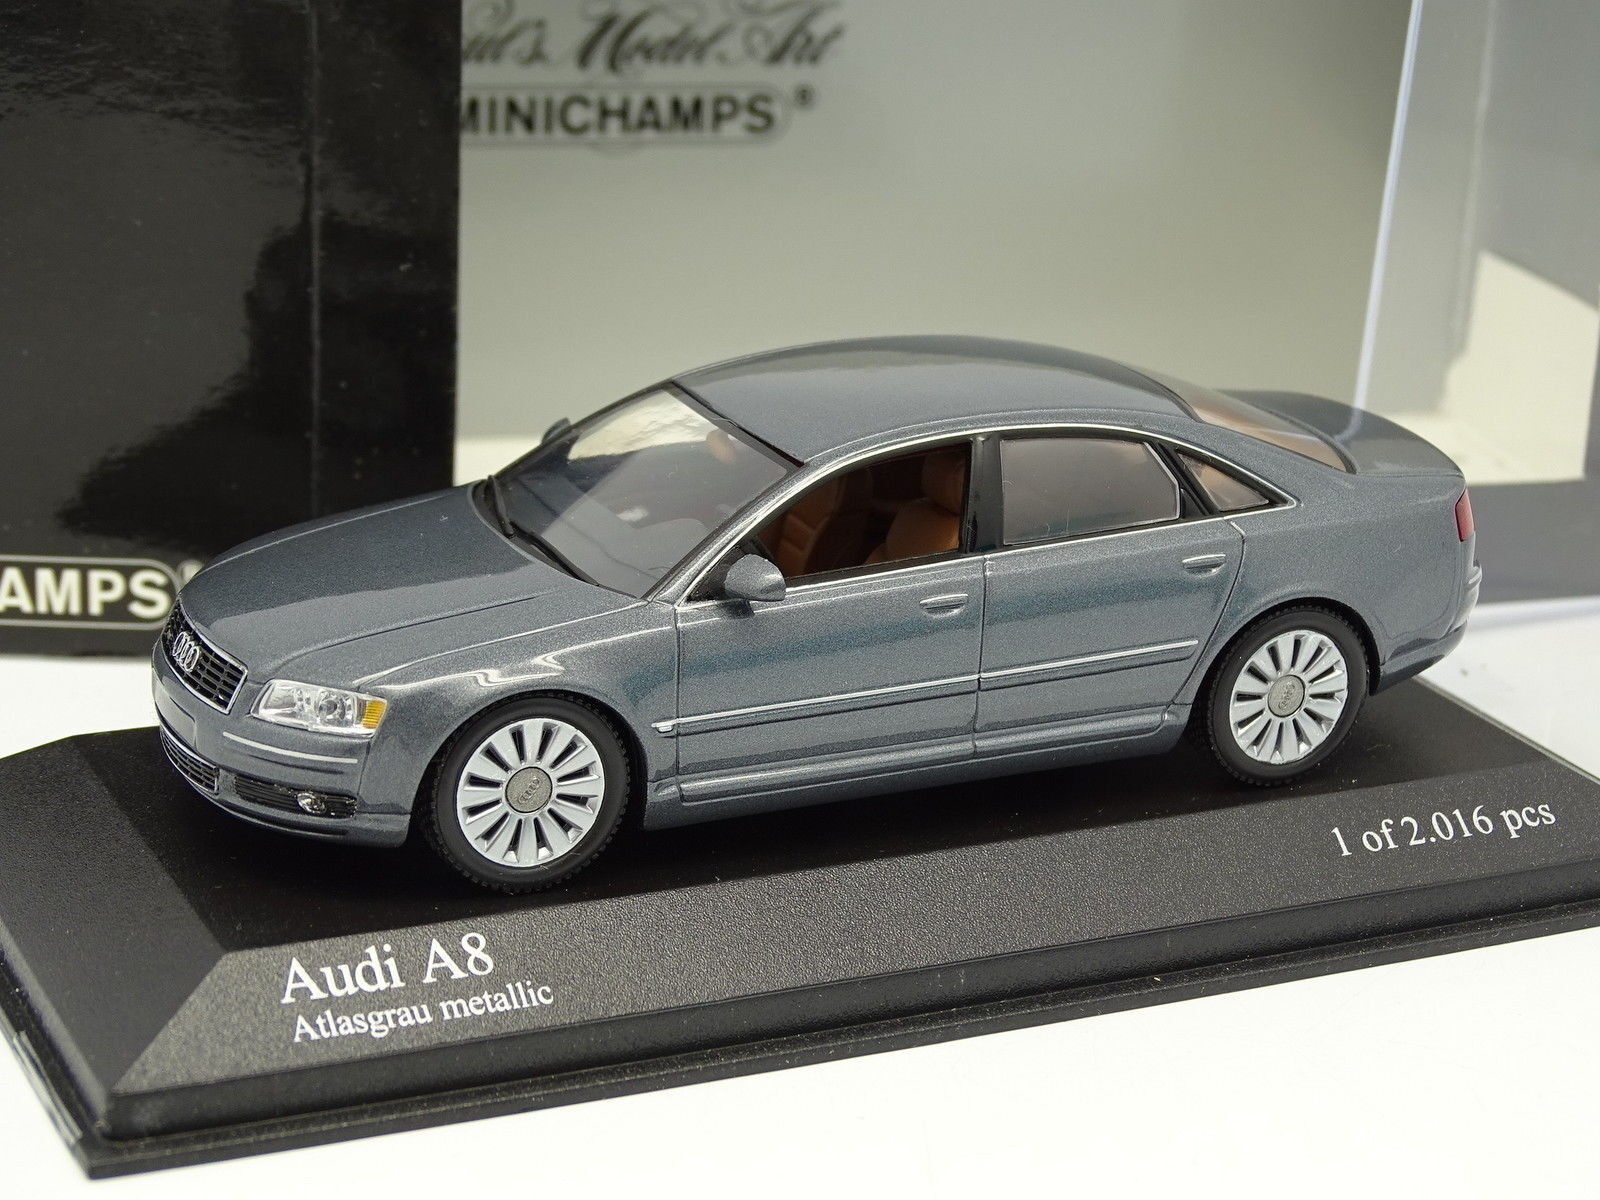 Minichamps 1 1 1 43 - Audi A8 2005 Grey 526334